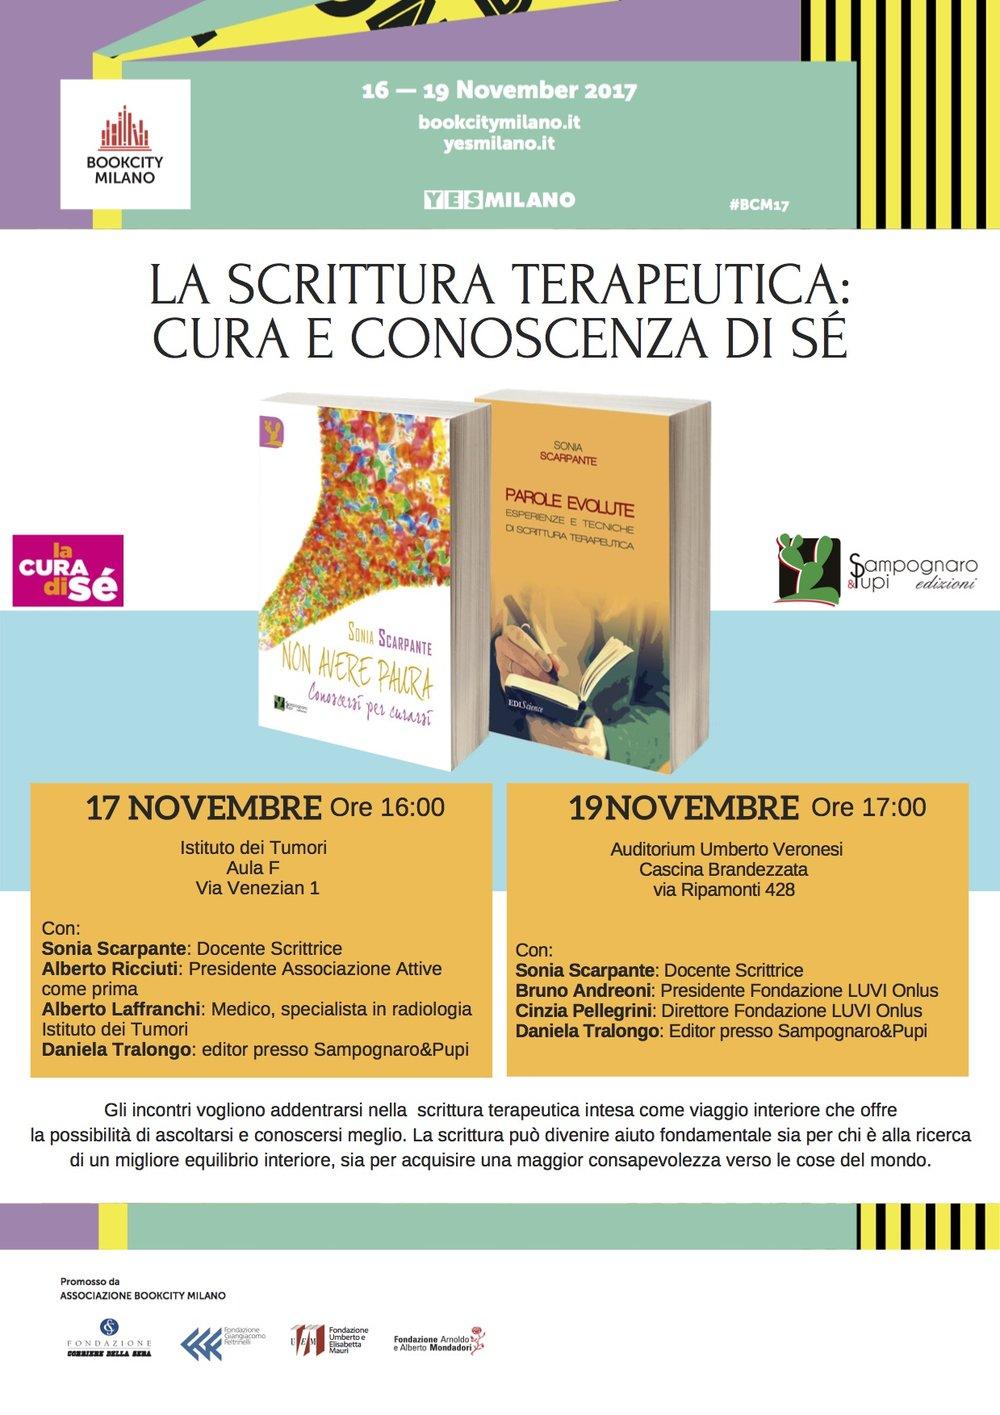 17-19 Bookcity.jpg